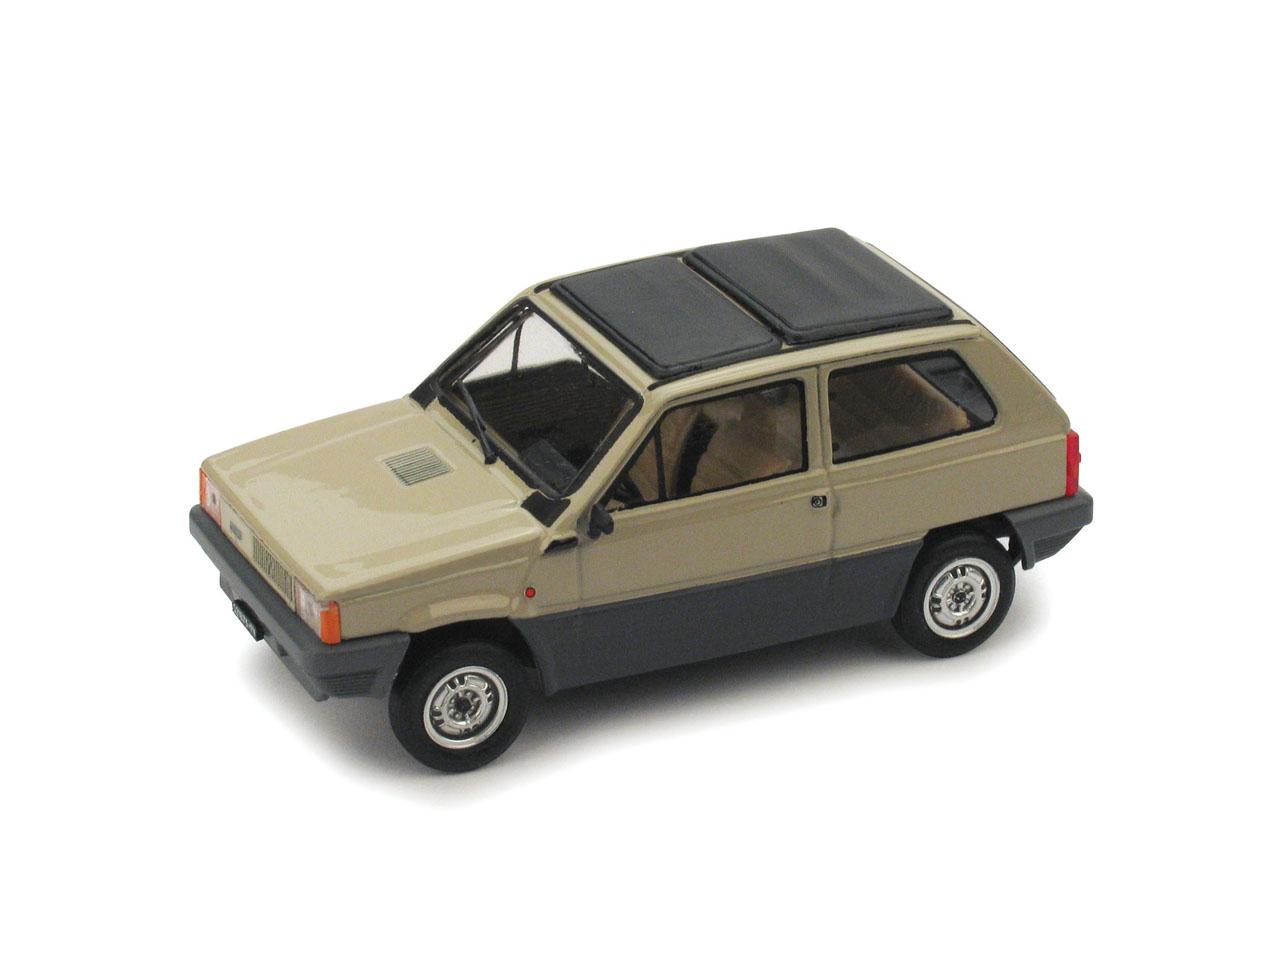 Fiat Panda 45 Techo de lona cerrado (1981) Brumm 1/43 Beige Kenia